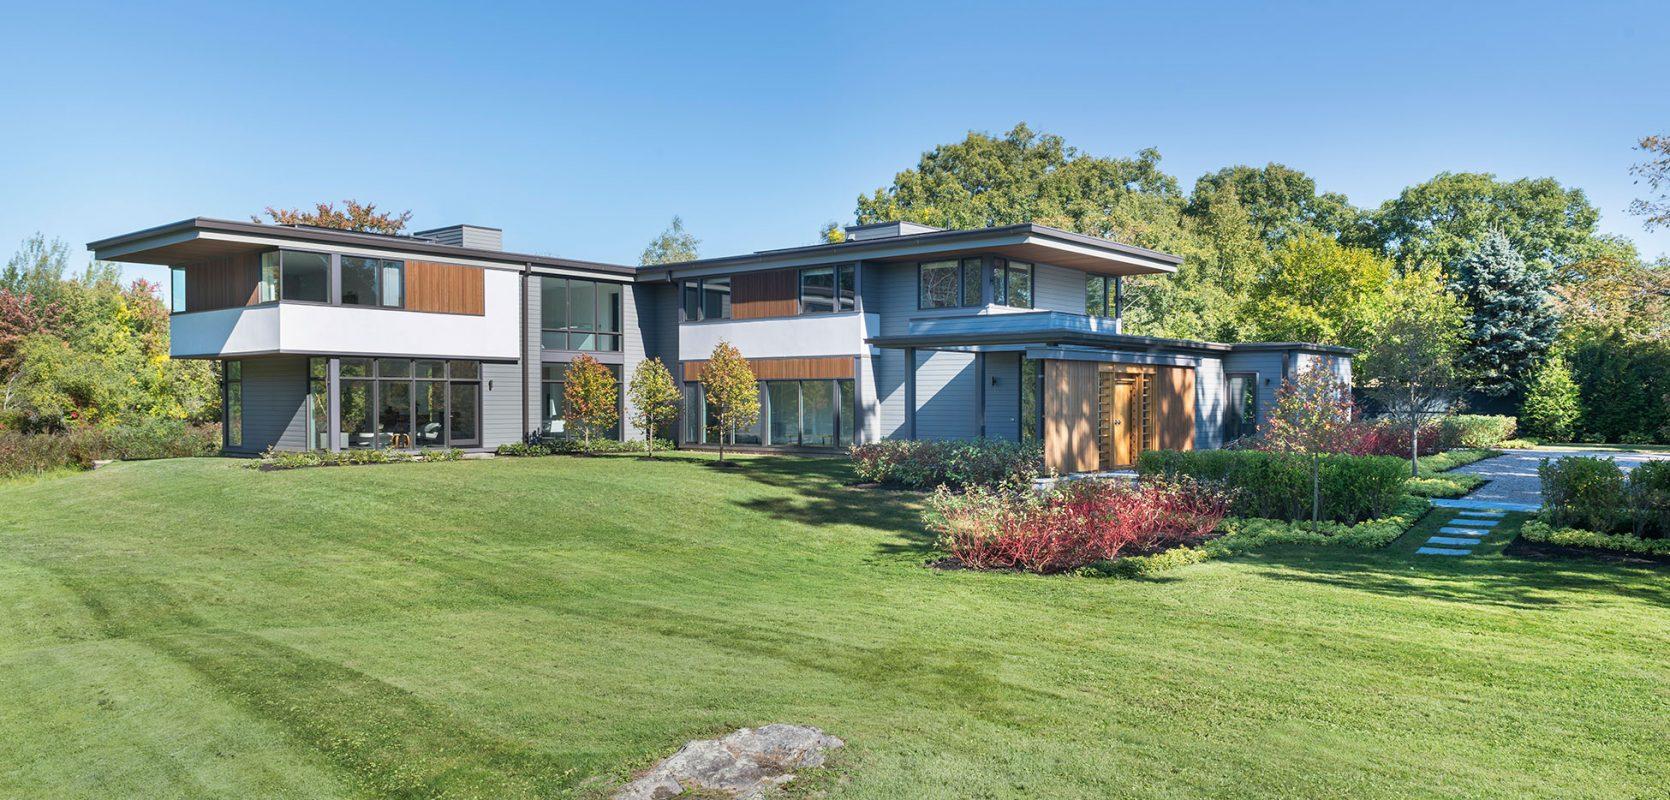 modern house on blueberry farm